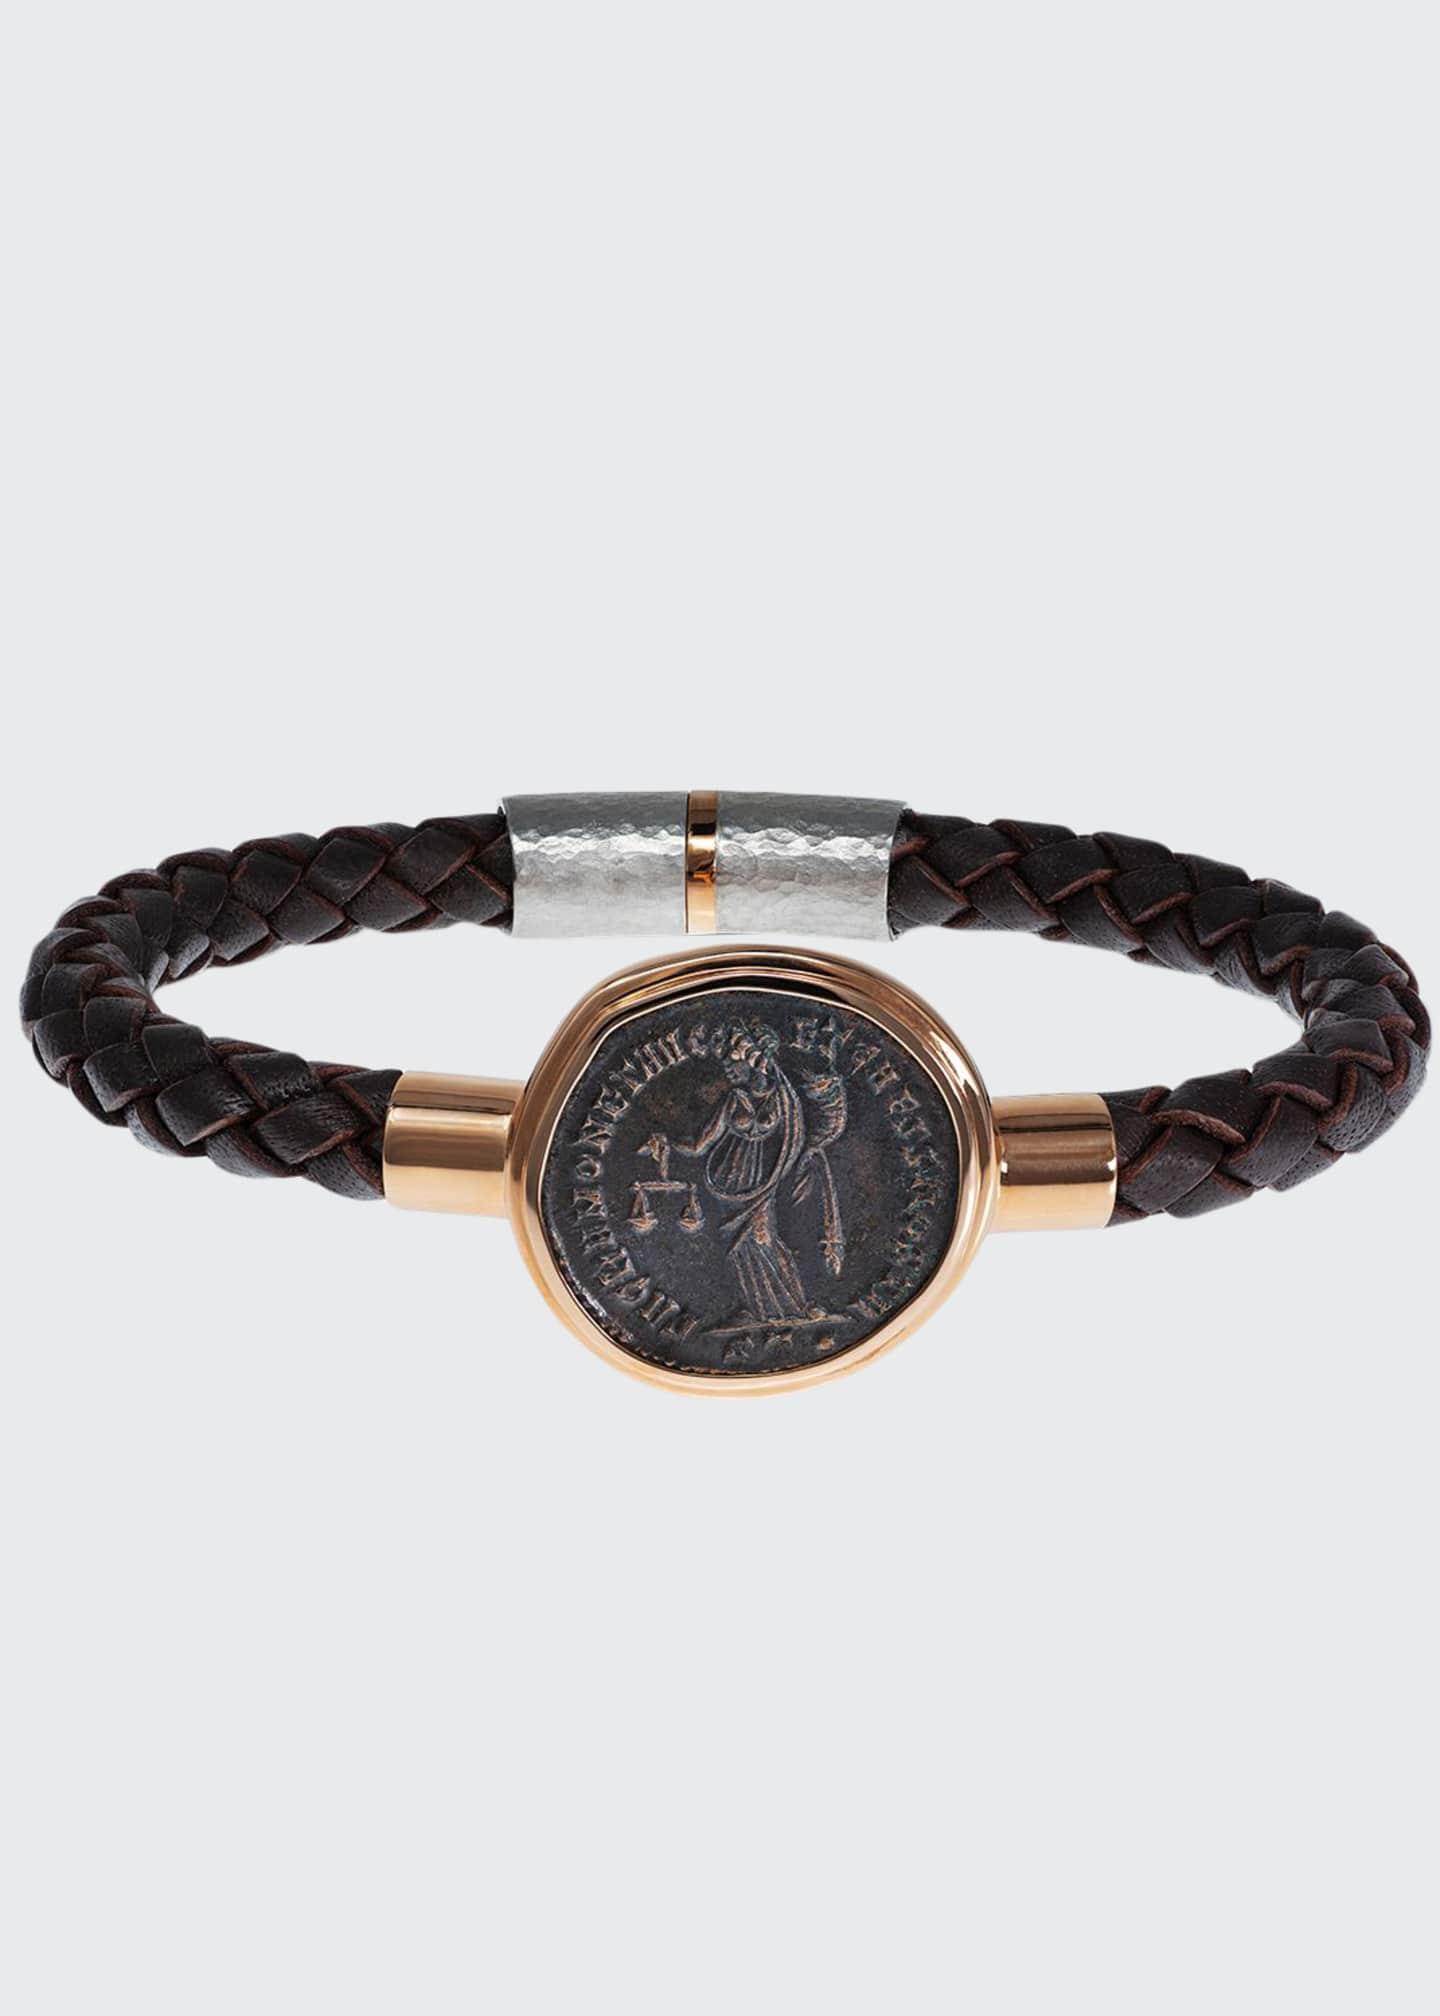 Jorge Adeler Men's Ancient Moneta Coin Braided Leather